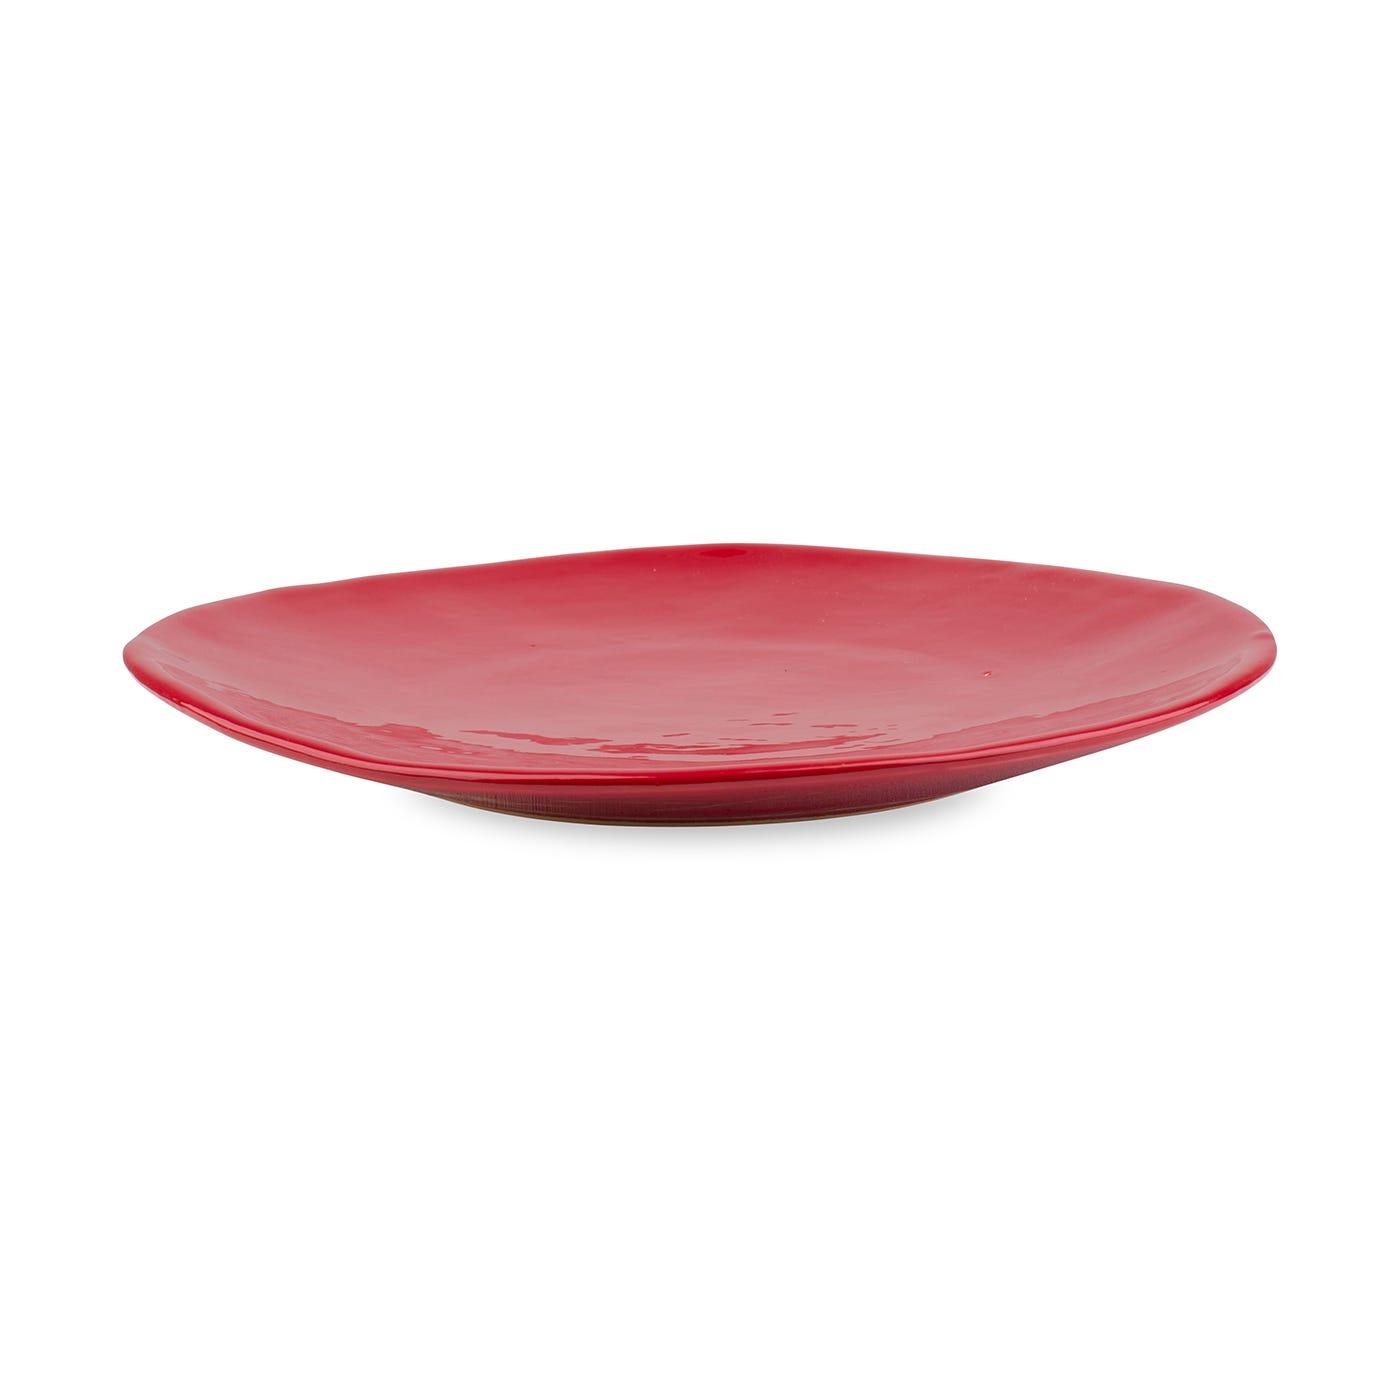 Red Glaze Dinner Plate